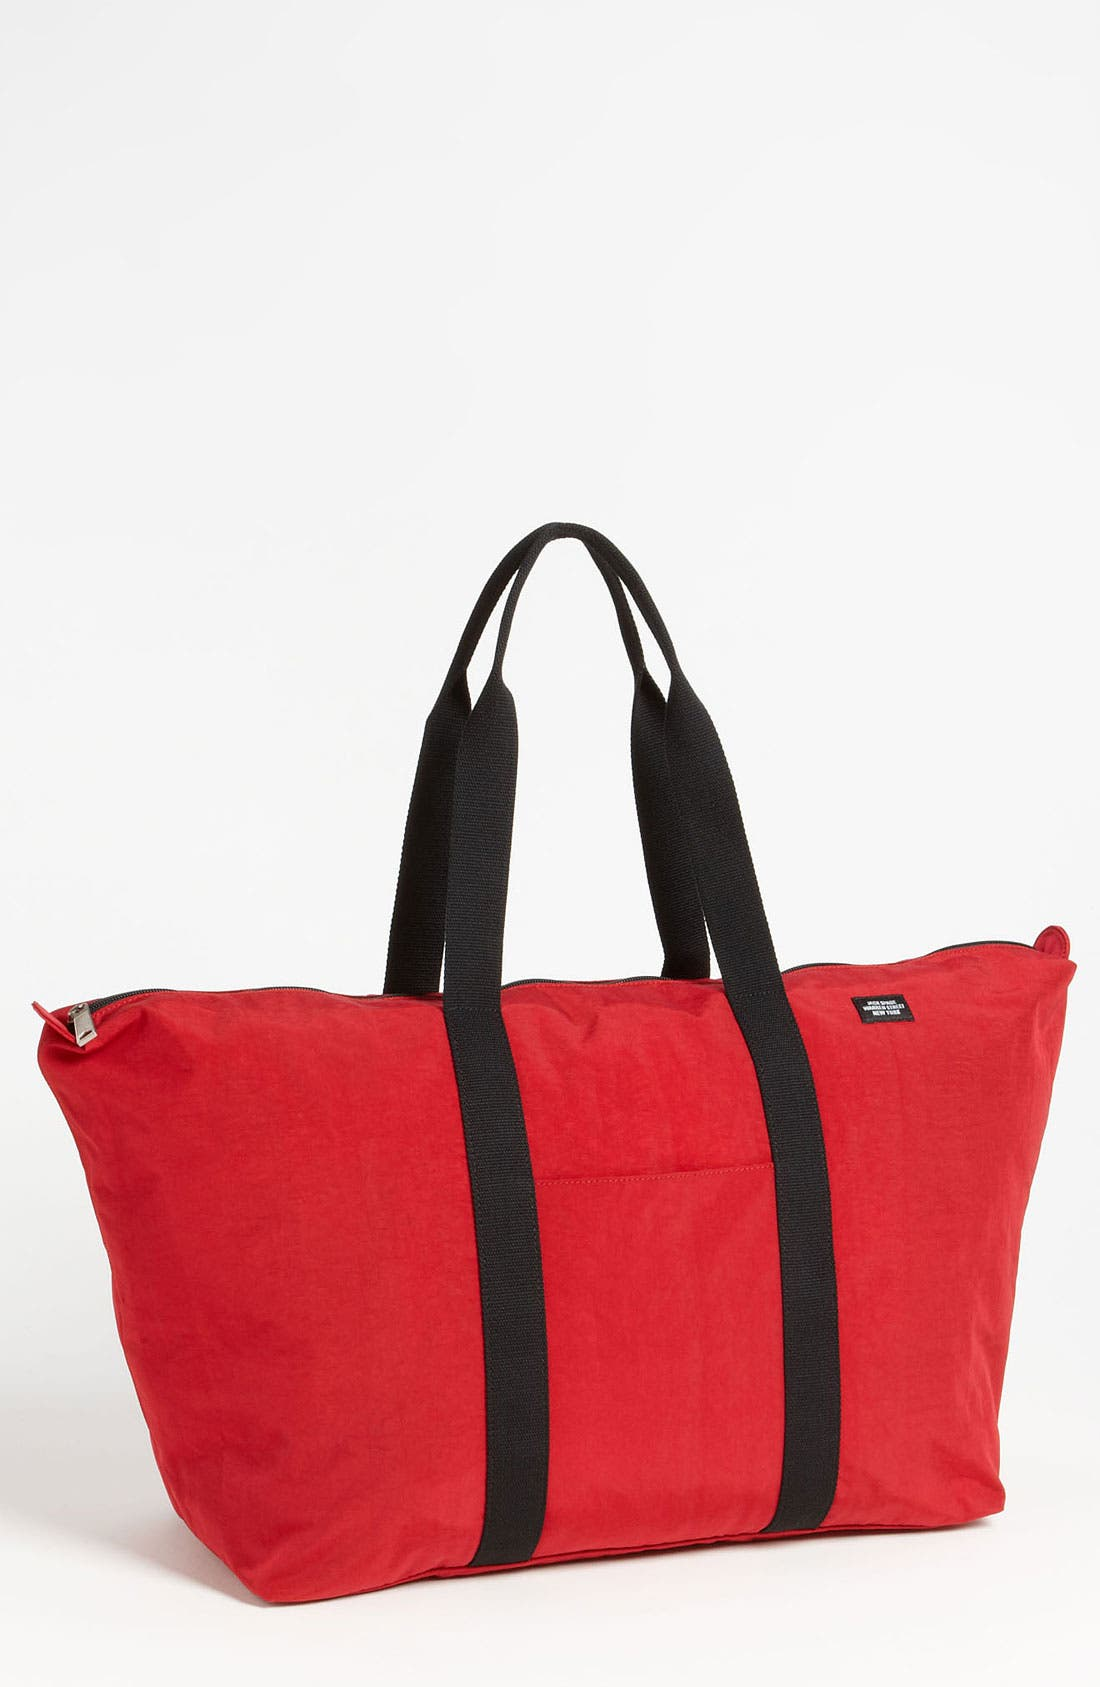 Alternate Image 1 Selected - Jack Spade Packable Duffel Bag